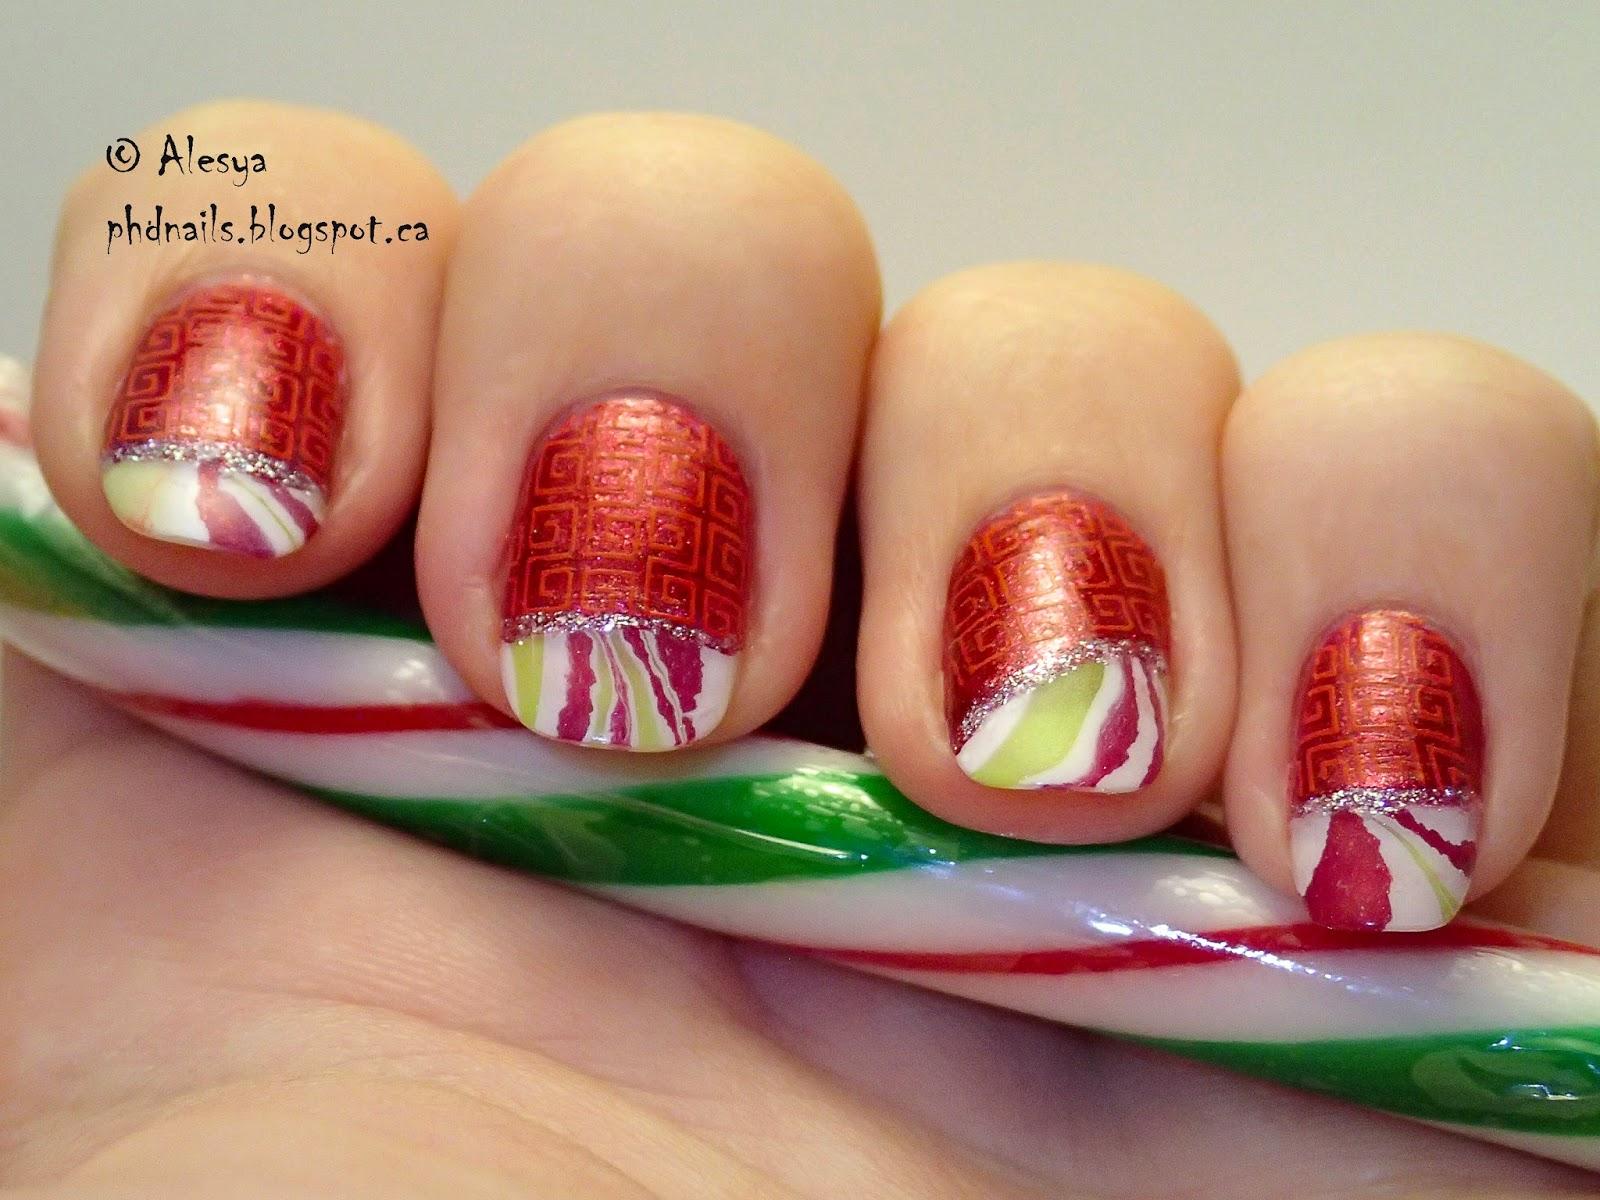 phd nails  winter nail art challenge  christmas candies